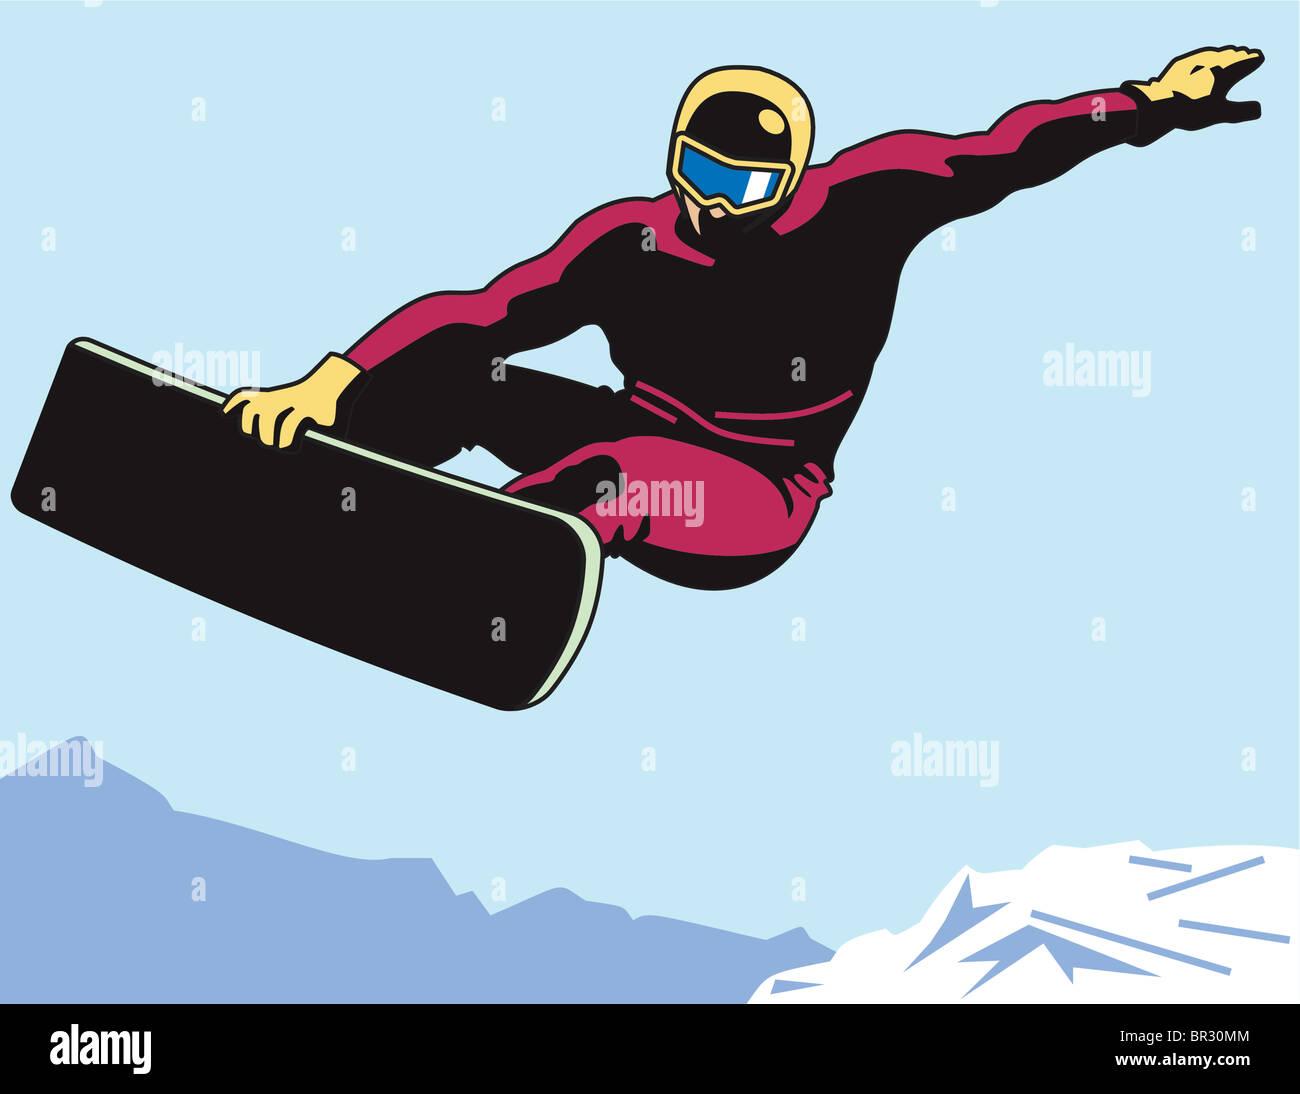 A man snowboarding - Stock Image